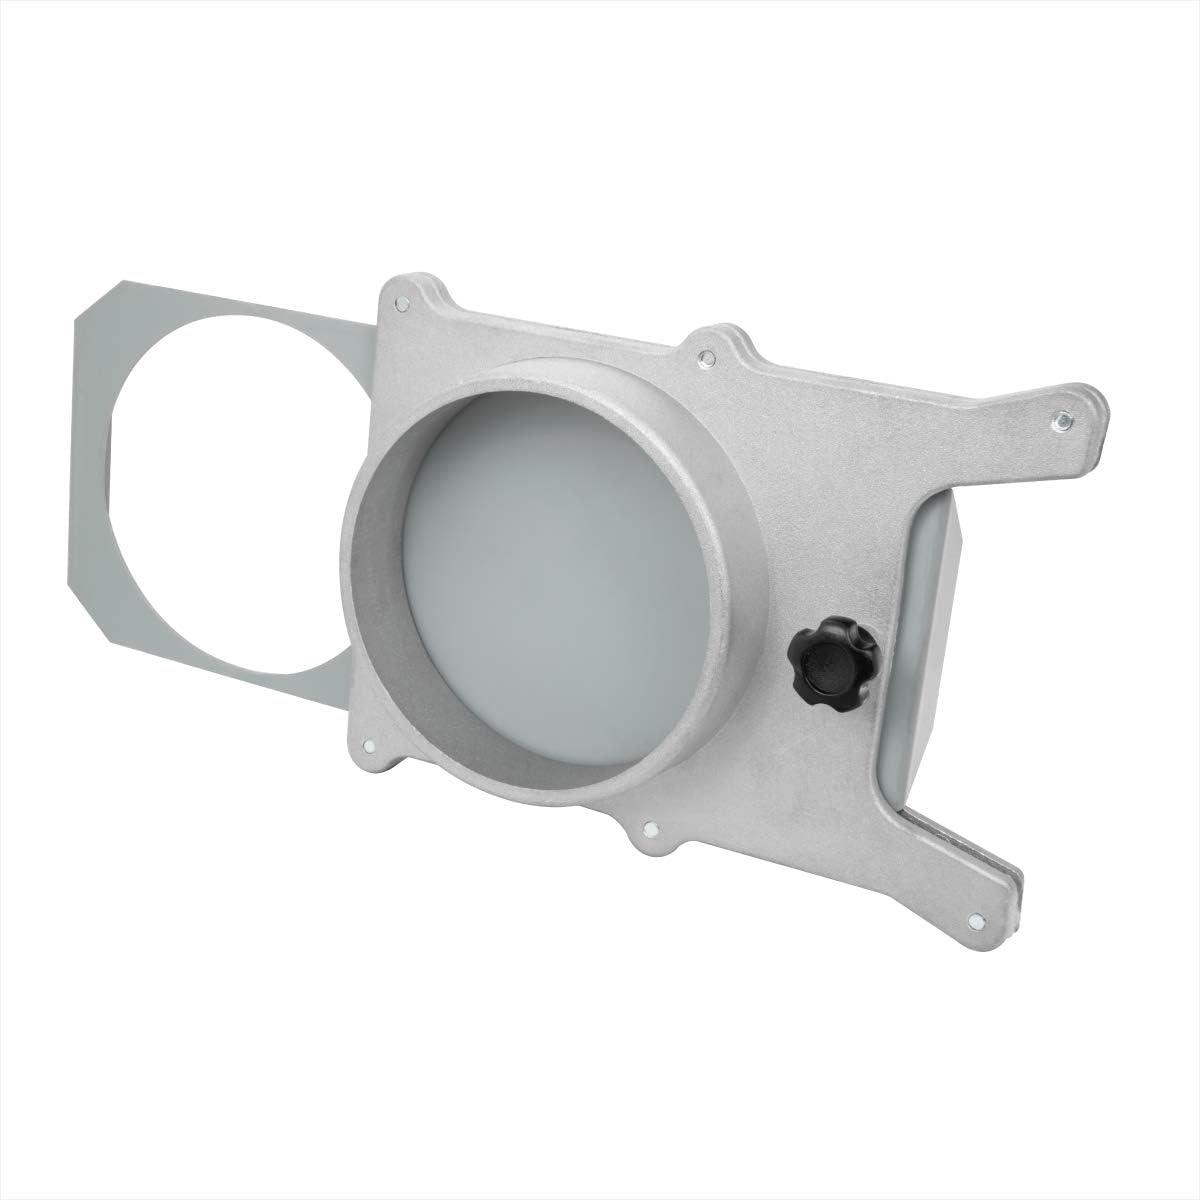 Powertec 4 Inch Aluminum Blast Gate Vacuum Dust Collector Collection System Part